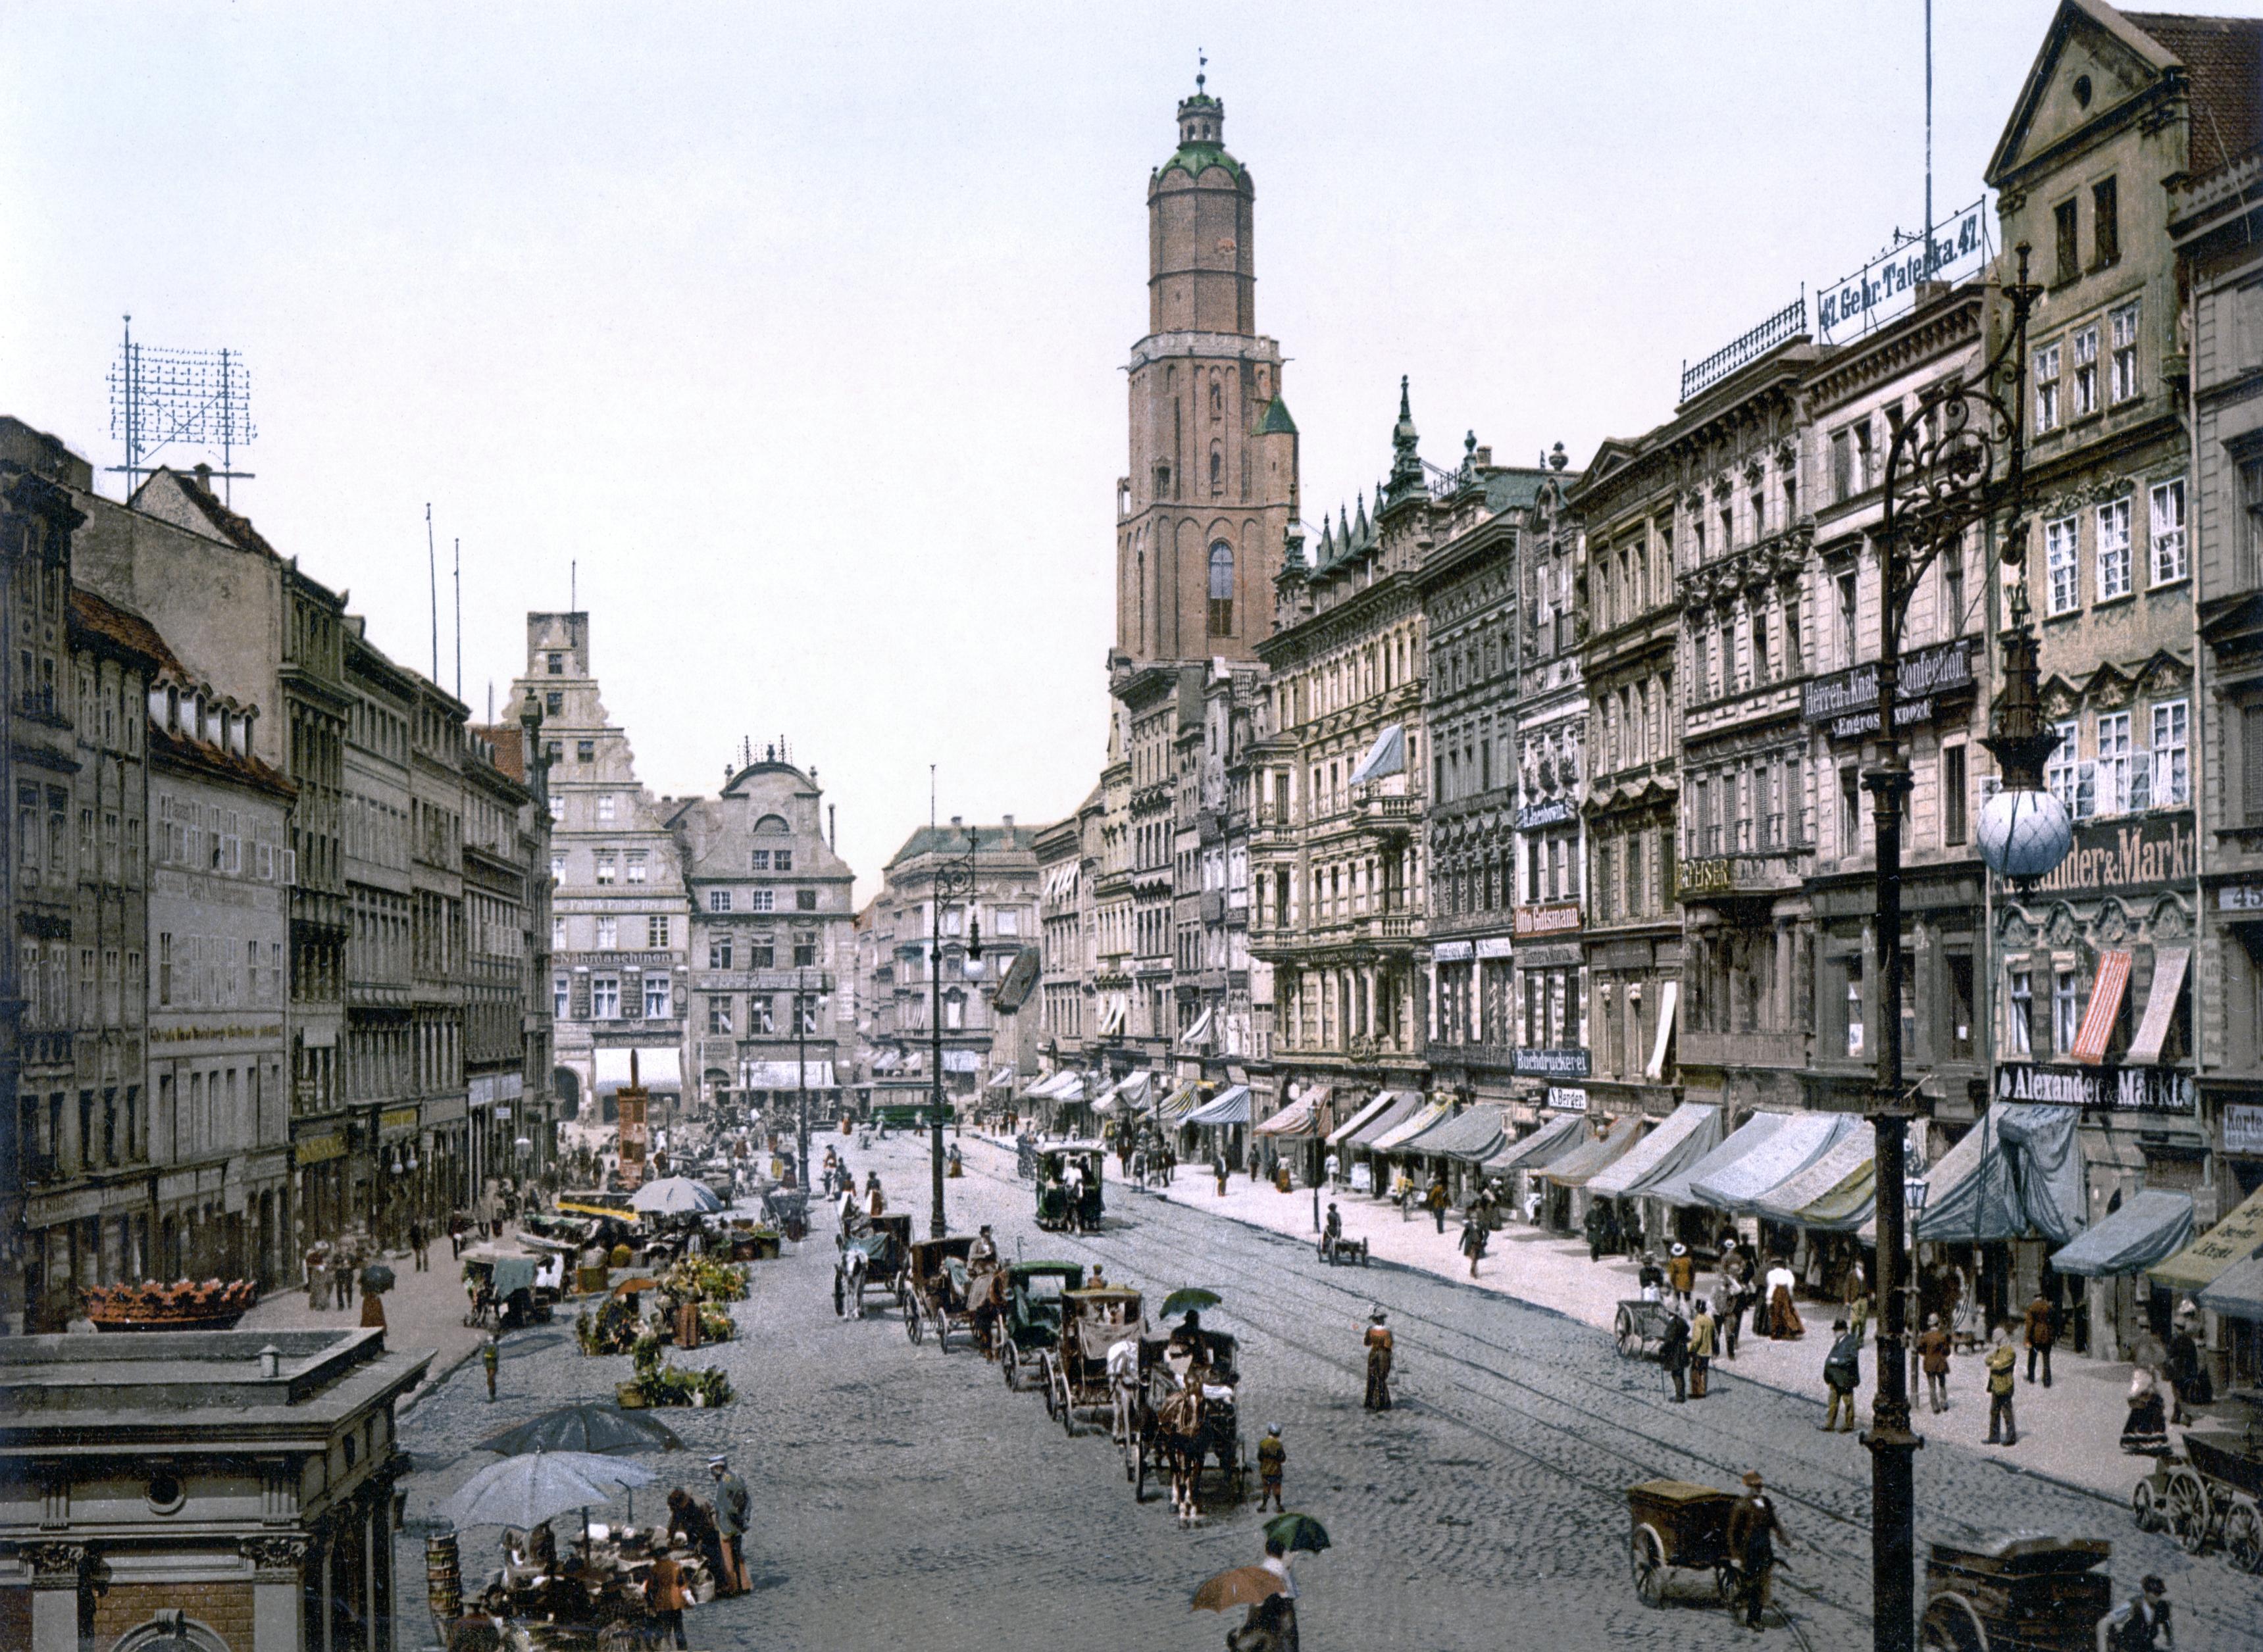 https://upload.wikimedia.org/wikipedia/commons/6/65/Breslau_Ring_Ostseite_%281890-1900%29.jpg